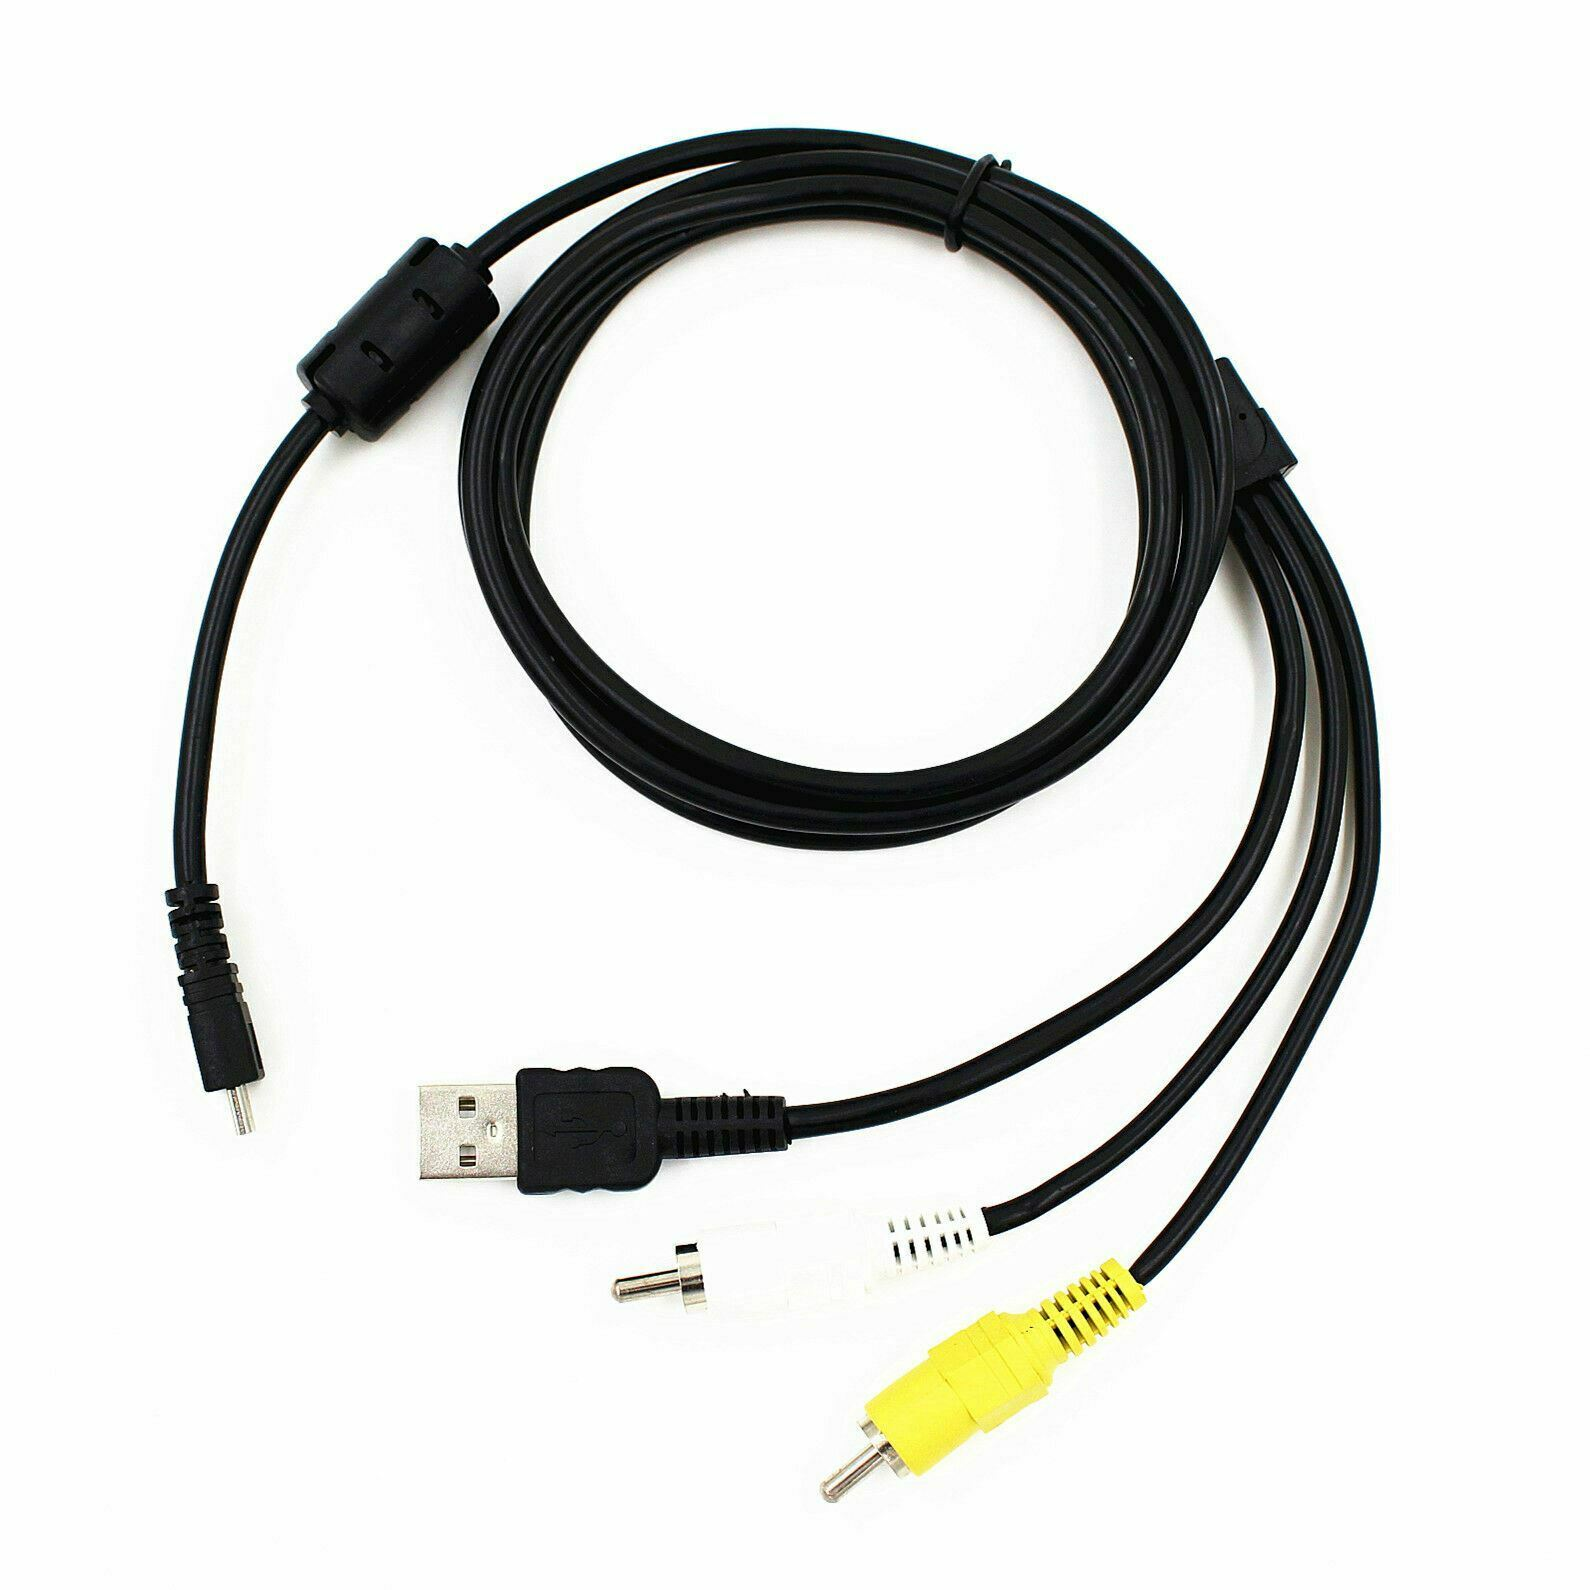 For Panasonic Lumix DMC-FP1 Camera 3 in 1 USB Charger Data AV TV Cable Lead